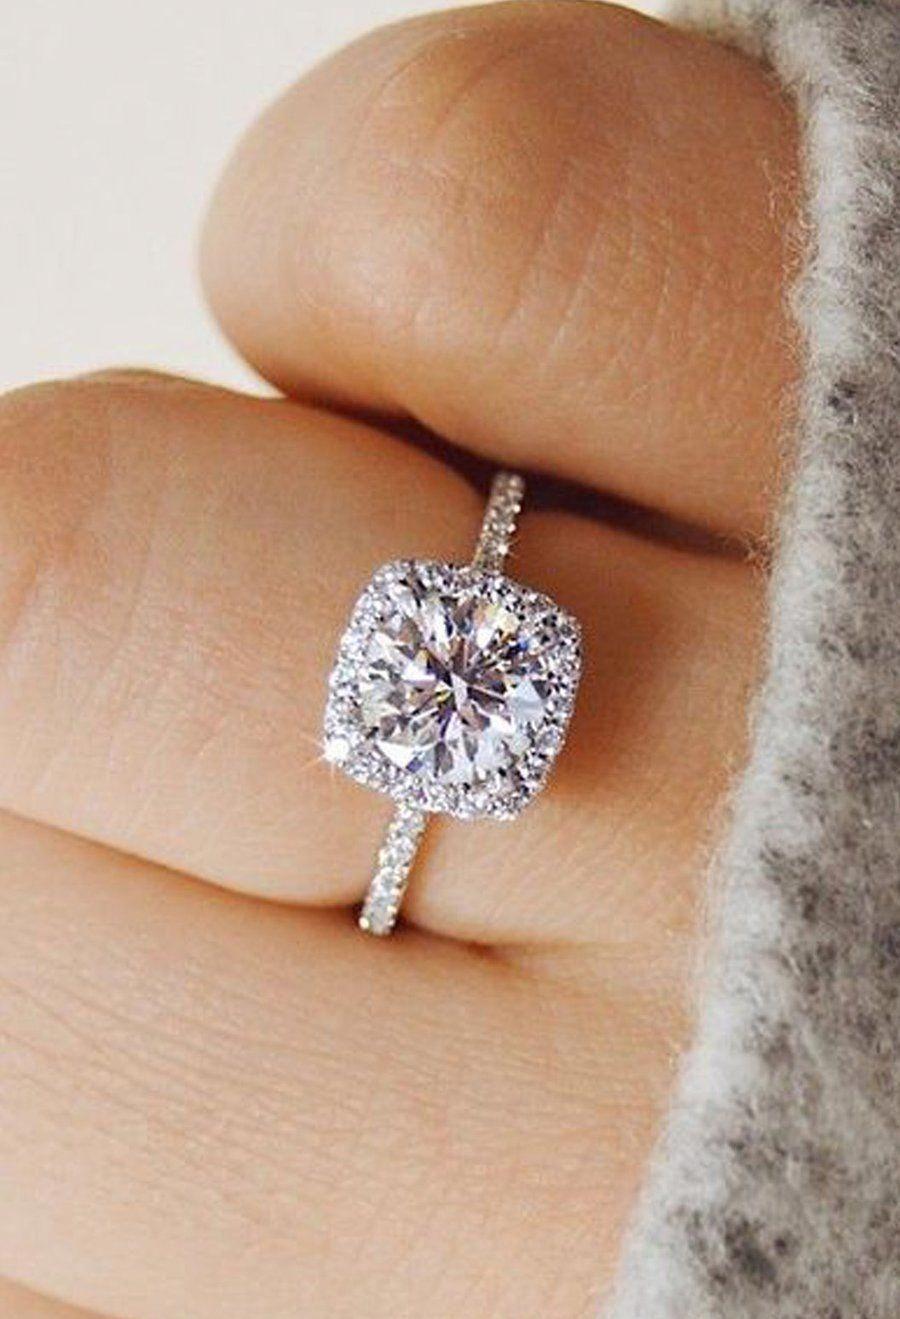 Natural Swiss blue topaz engagement ring set,5x7mm oval cut,14k white gold diamond wedding band,3pcs anniversary rings,thin diamond band #cushionengagementring